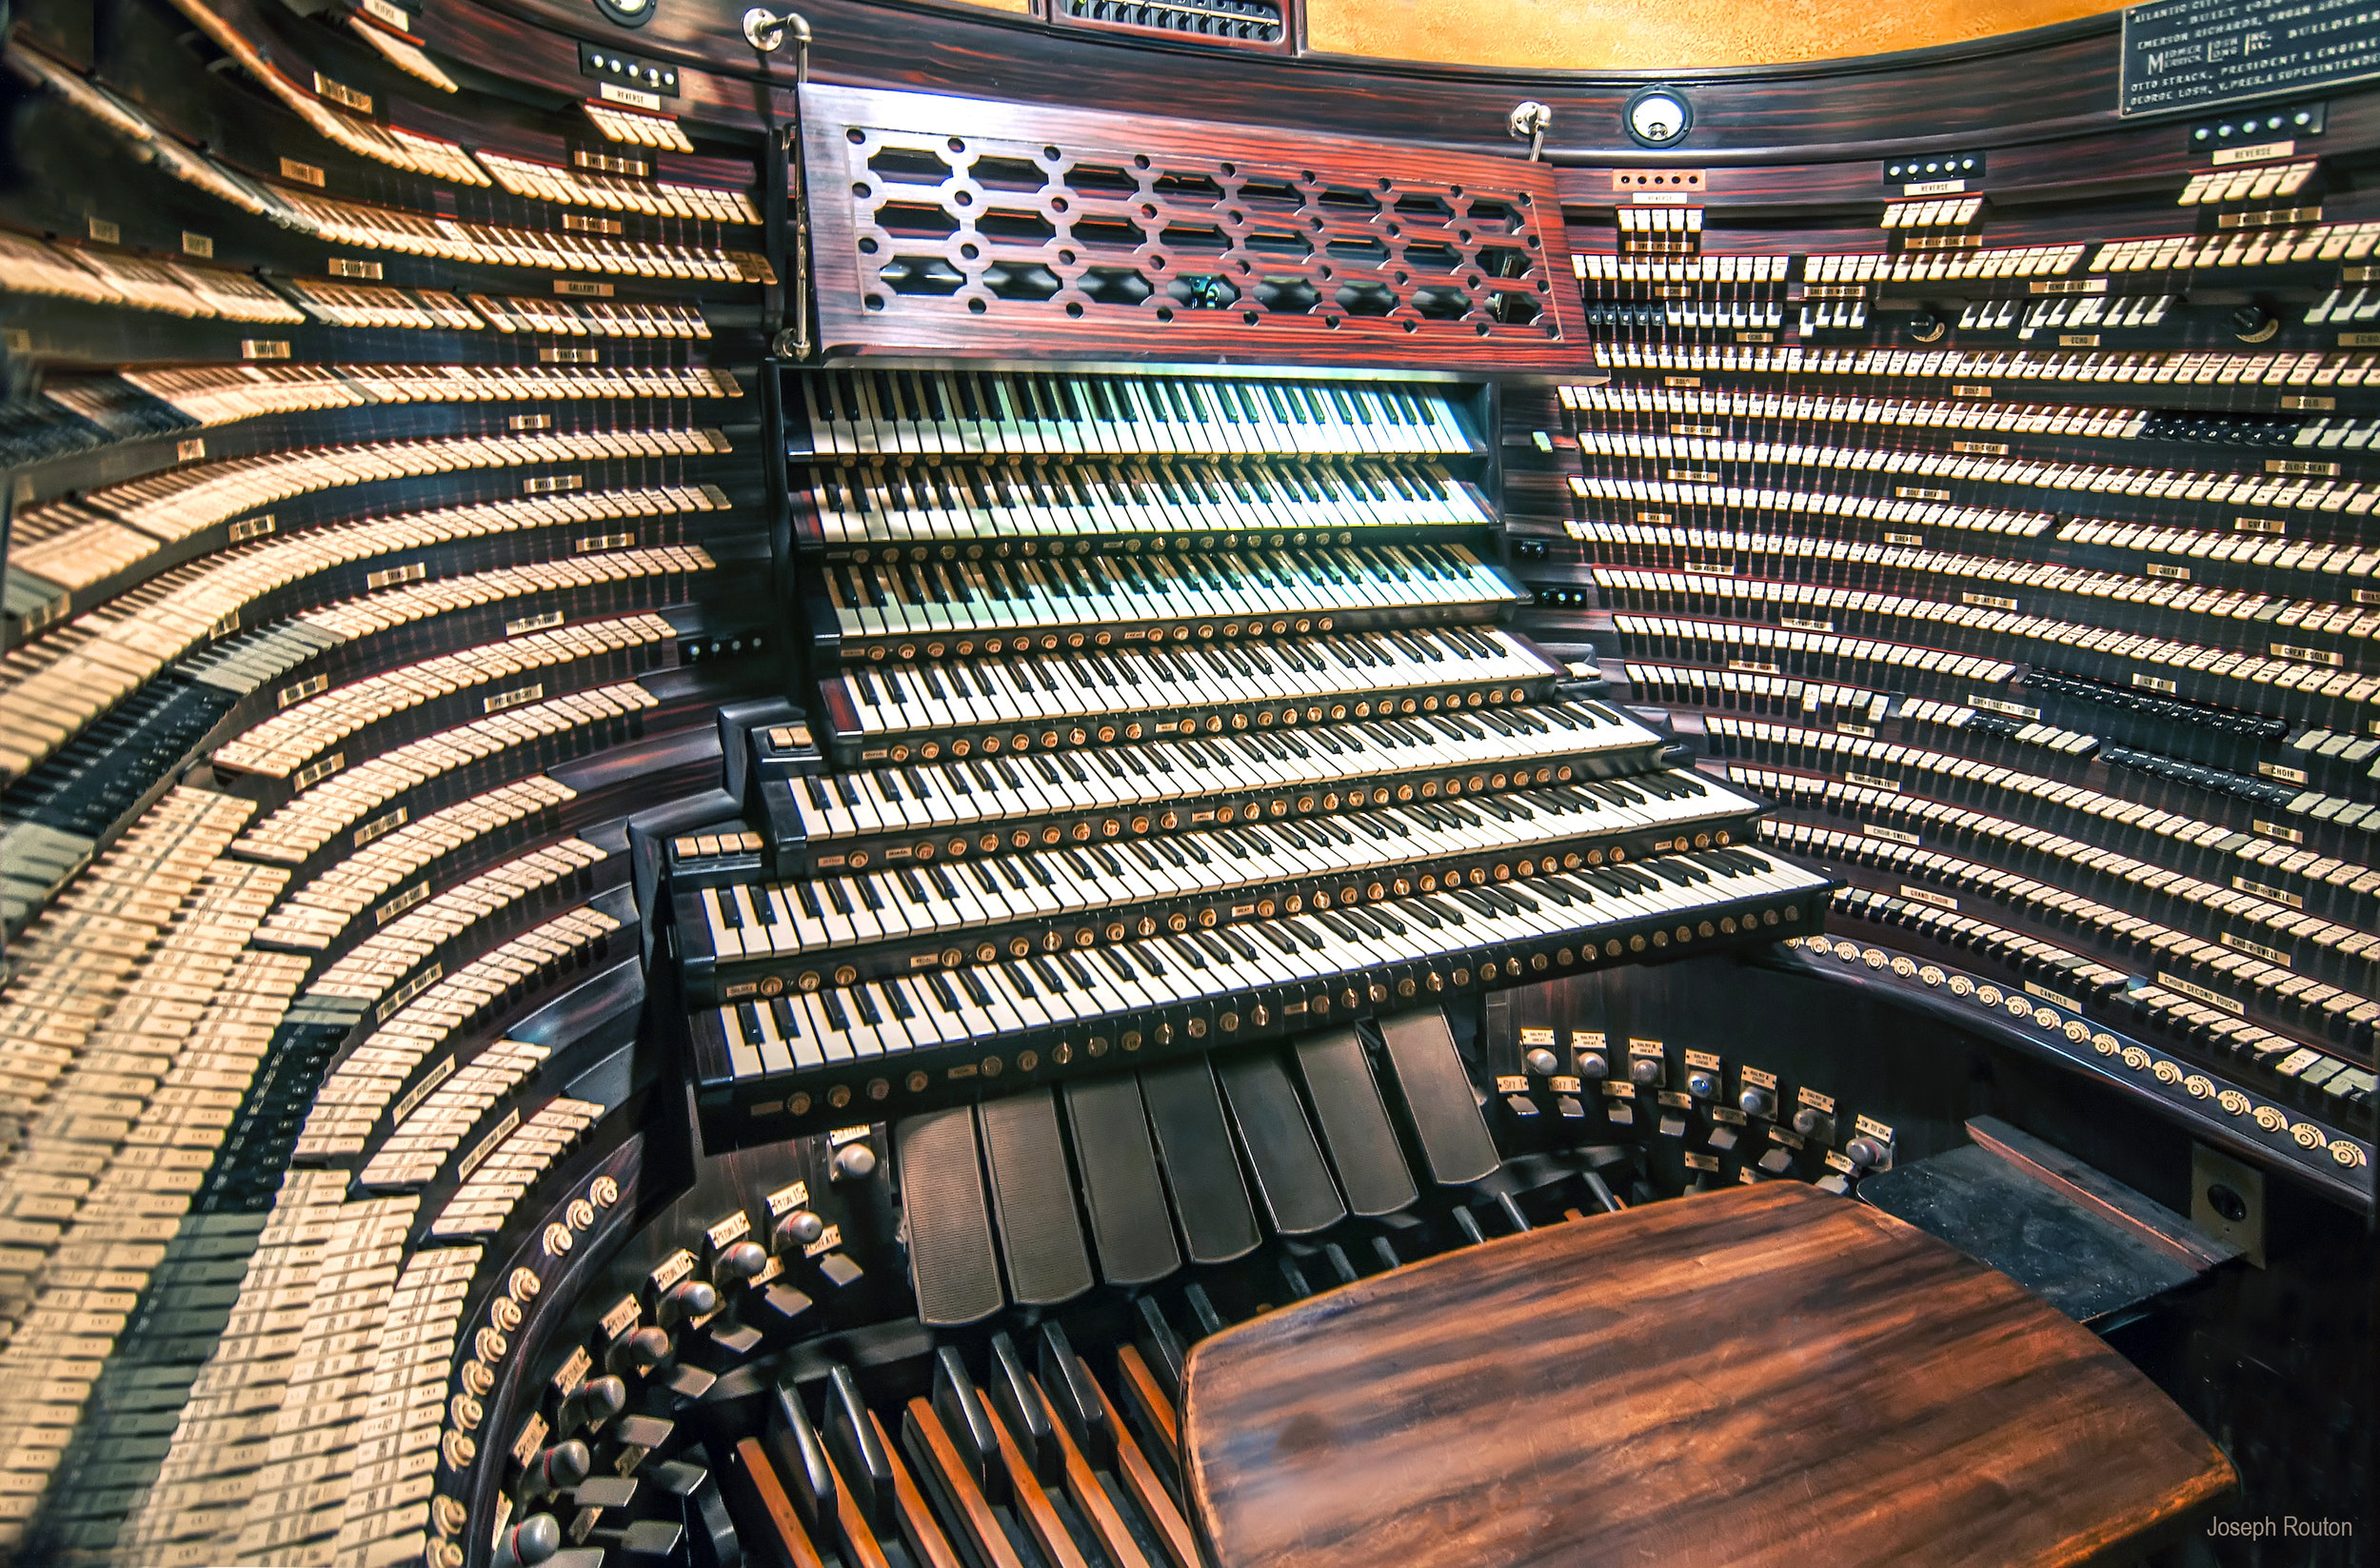 The Midmer-Losh Organ in the main auditorium of Boardwalk Hall, Atlantic City, NJ